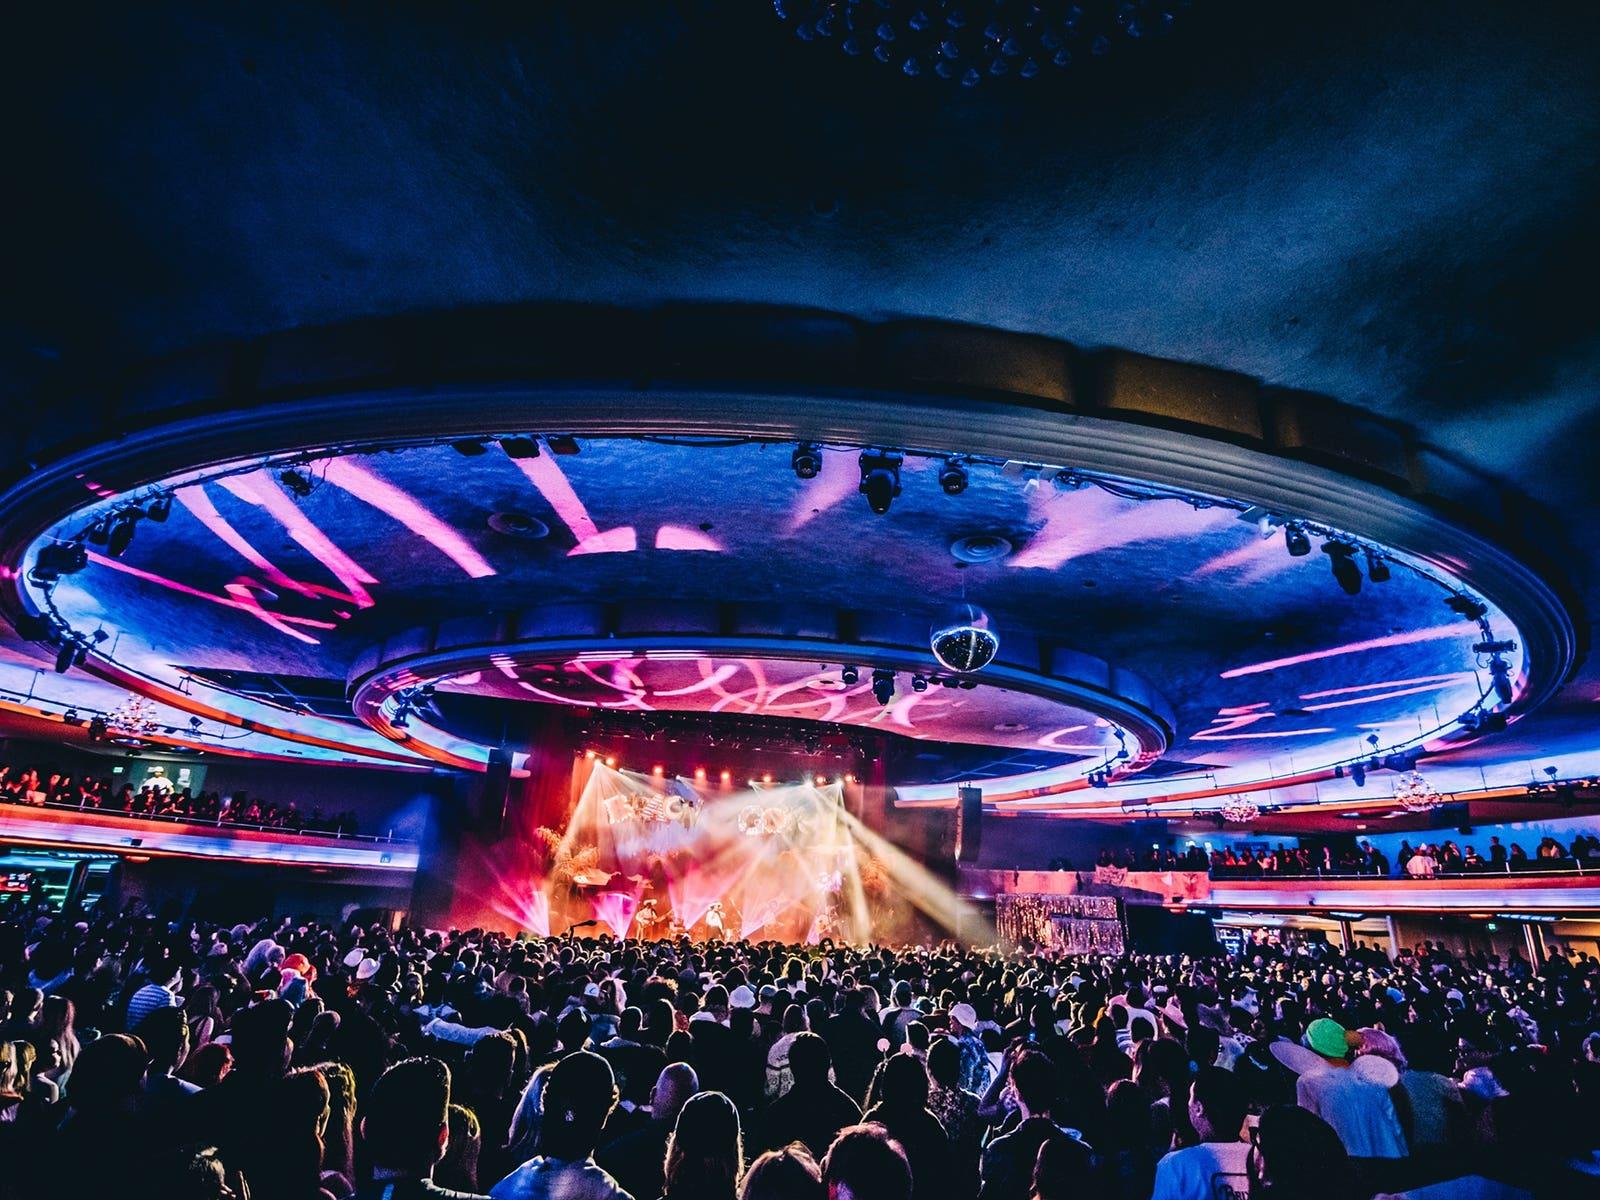 Concert at The Hollywood Palladium